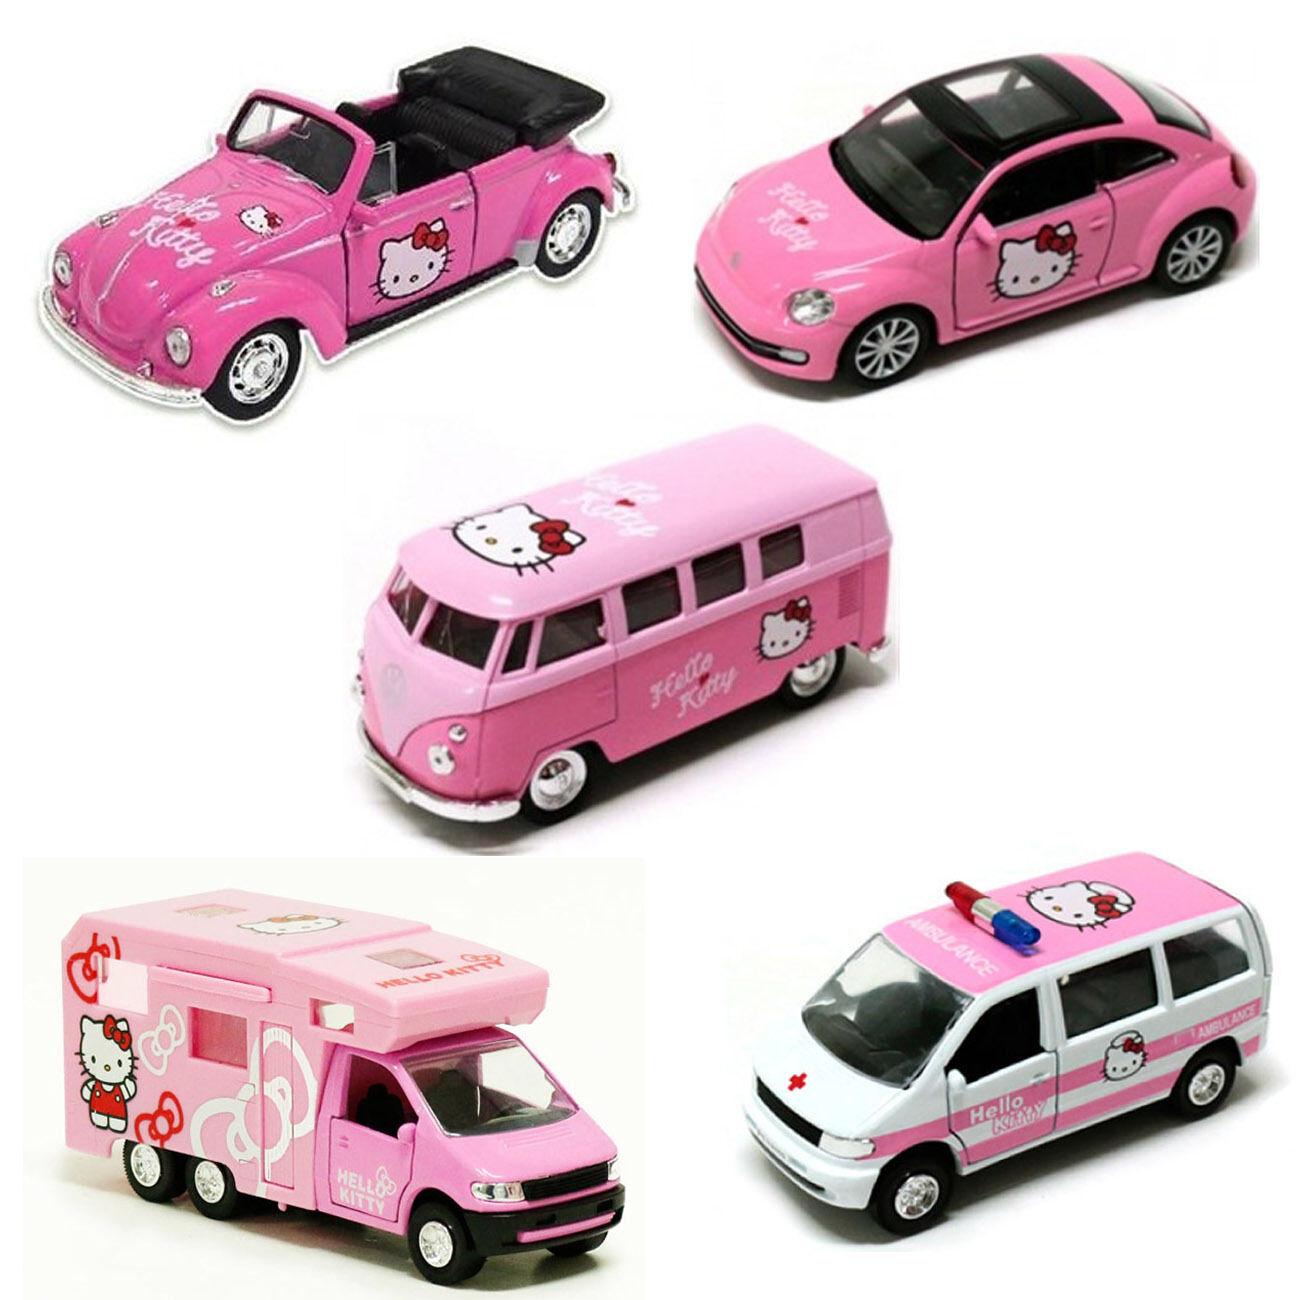 Hello Kitty Mini Coche 5 un. Set Coche Clásico Figura Juguete para Niños Niños